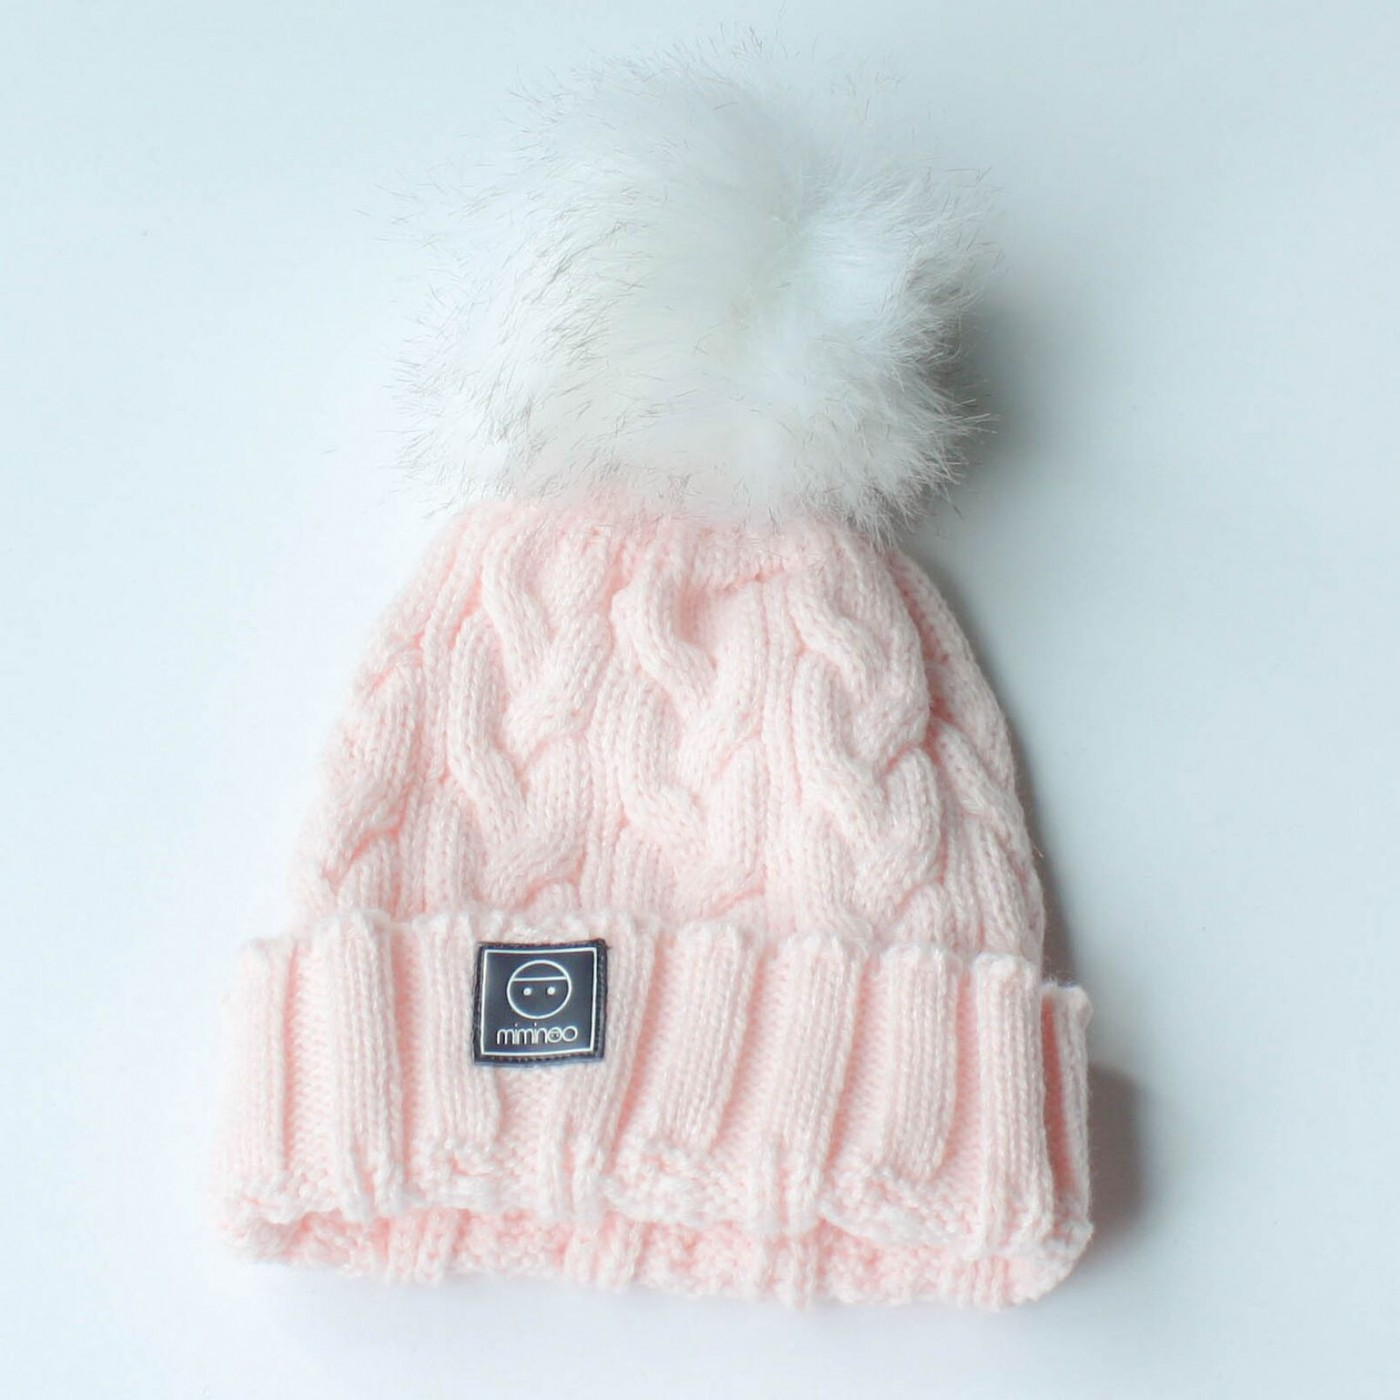 e8b91cbb366 fabulous bonnet tricote rose pompon blanc loading zoom with bonnet ours  tricot